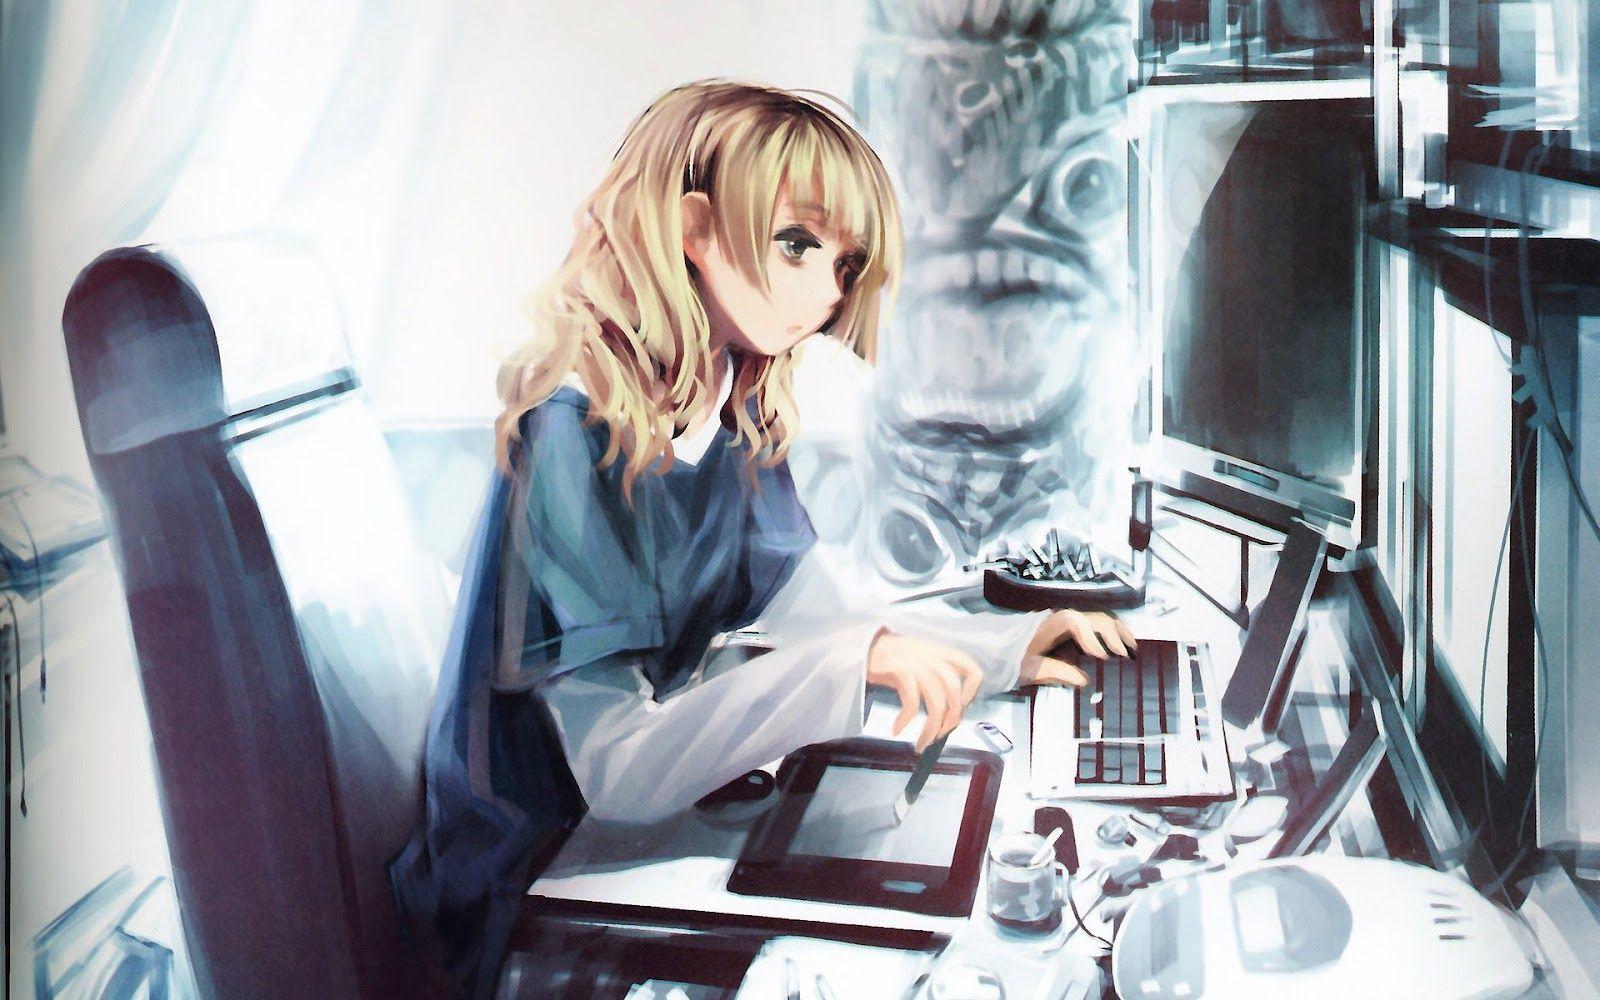 Pin On Anime Photogs